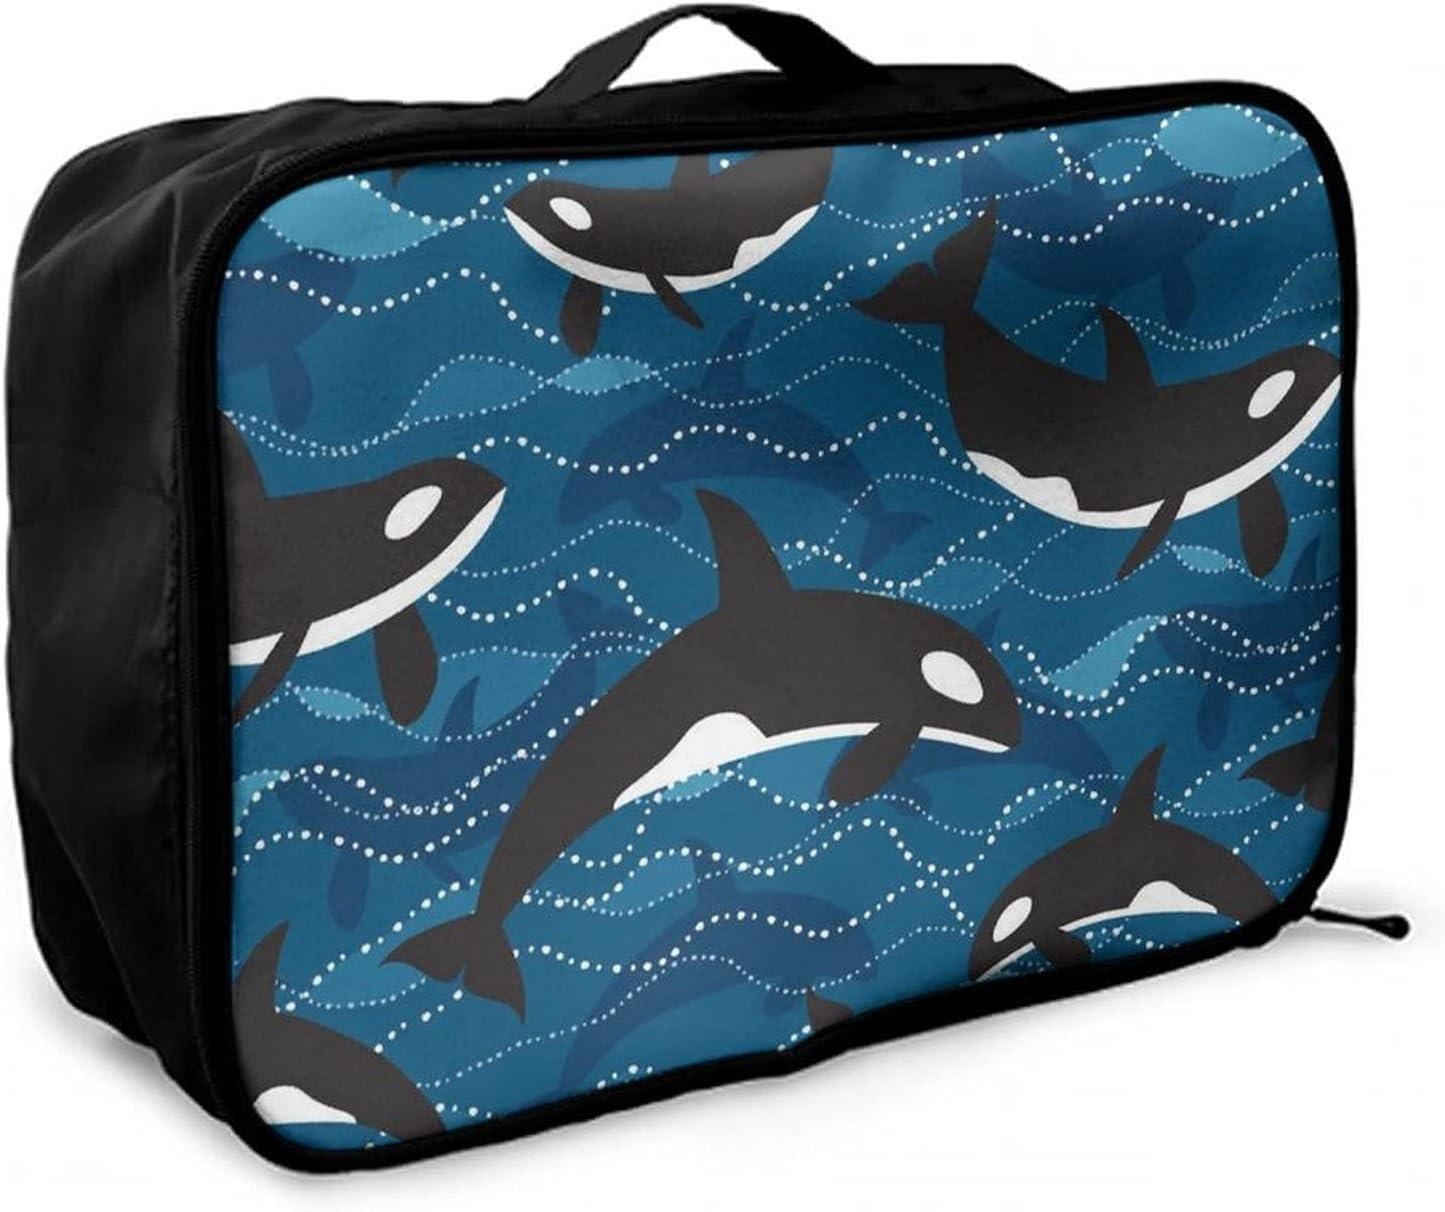 NiYoung Travel mart Duffle Bag in Handle Lightweight Weekende latest Trolley